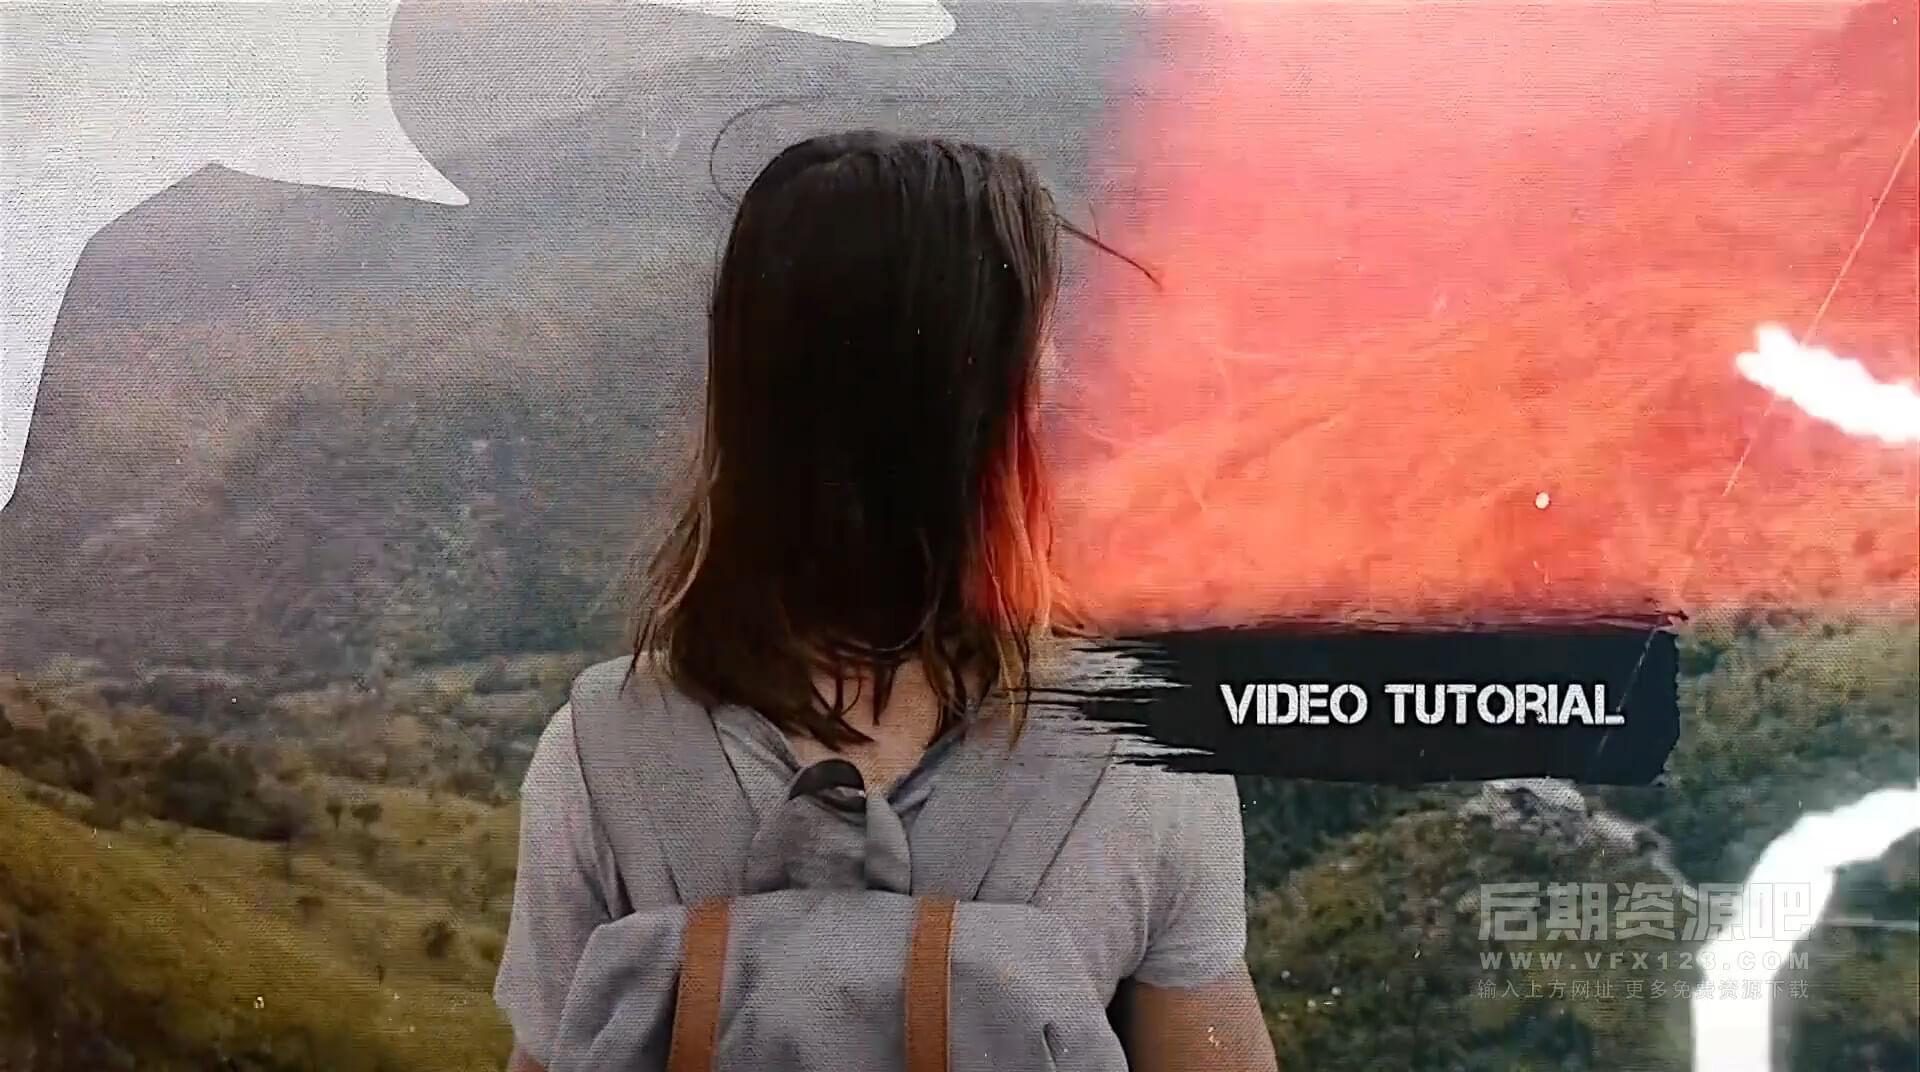 Fcpx主题插件 炫酷时尚定格动画效果图片视频展示模板 Stop Motion Grunge